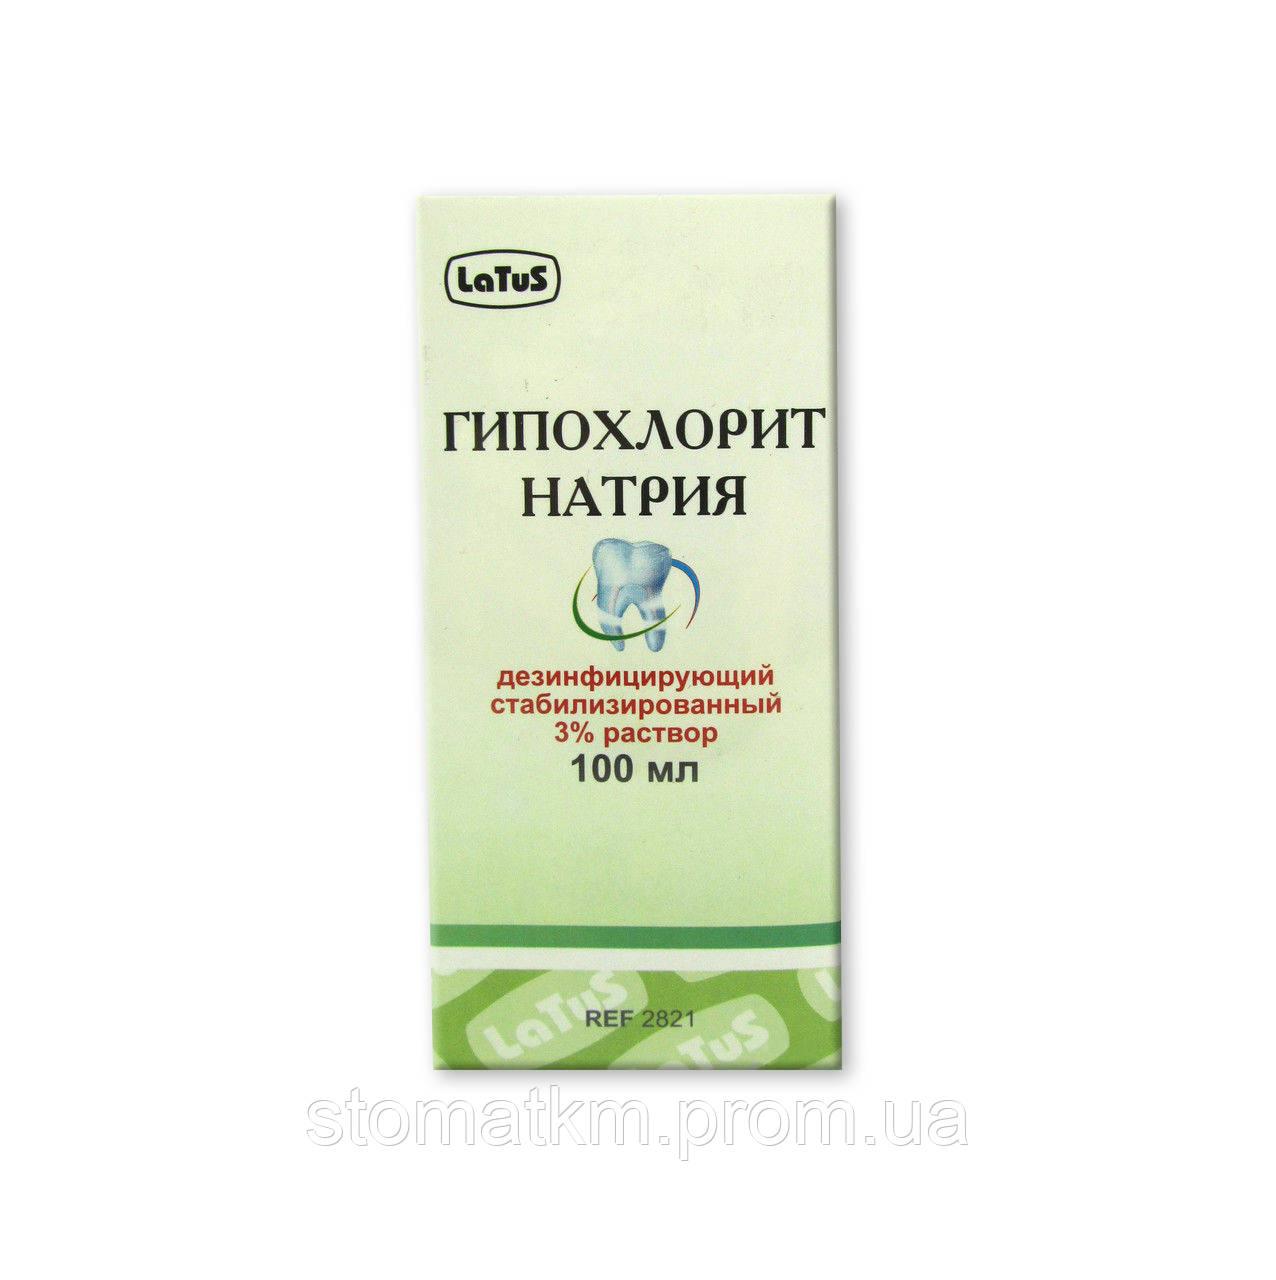 Гипохлорит натрия 3% ZOOBLE